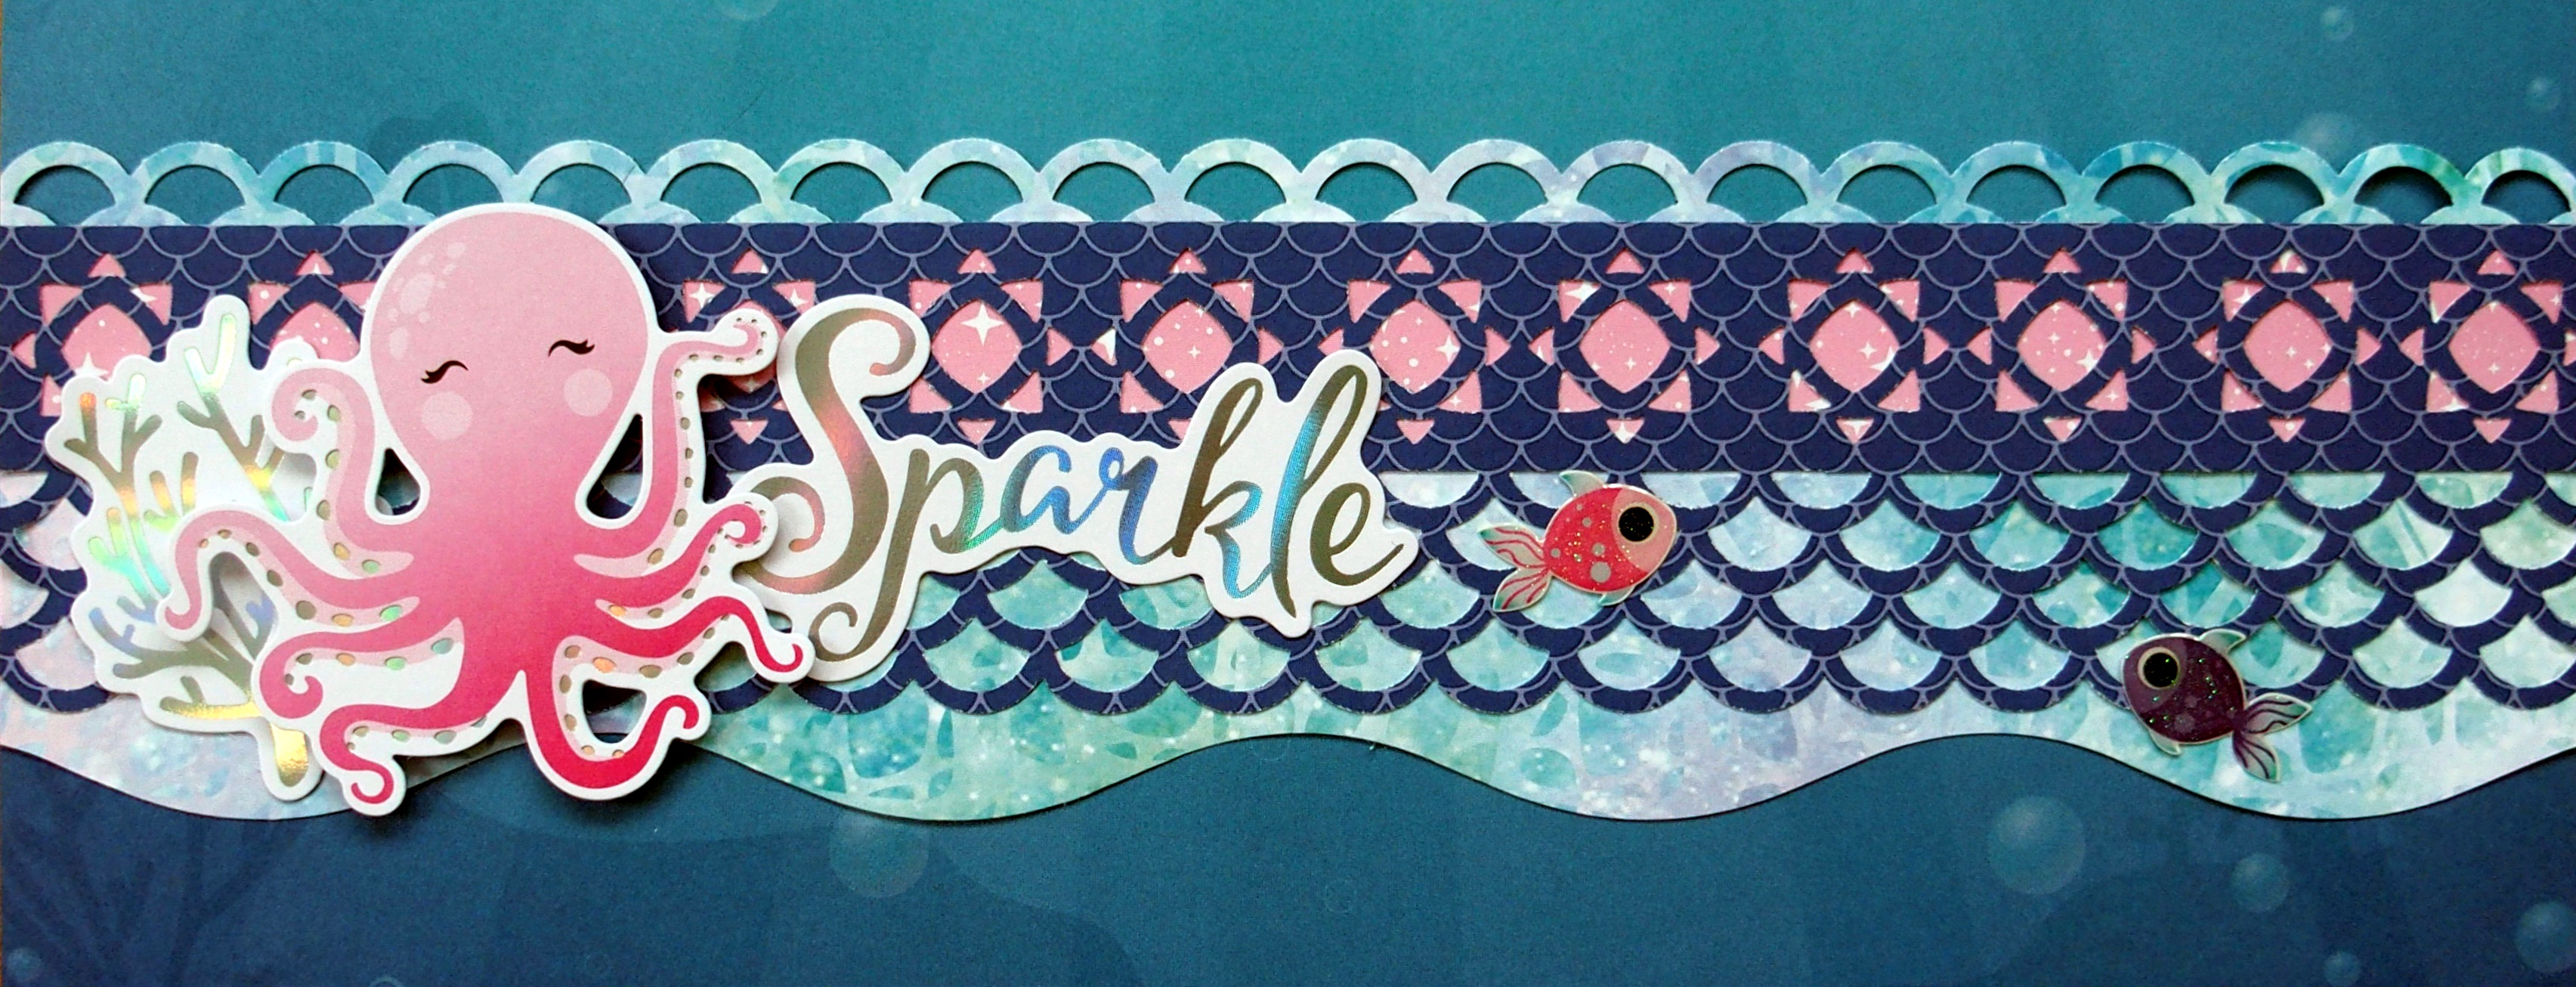 Mermaid-Cove-Collection-Scrapbooking-Borders-Creative-Memories-1